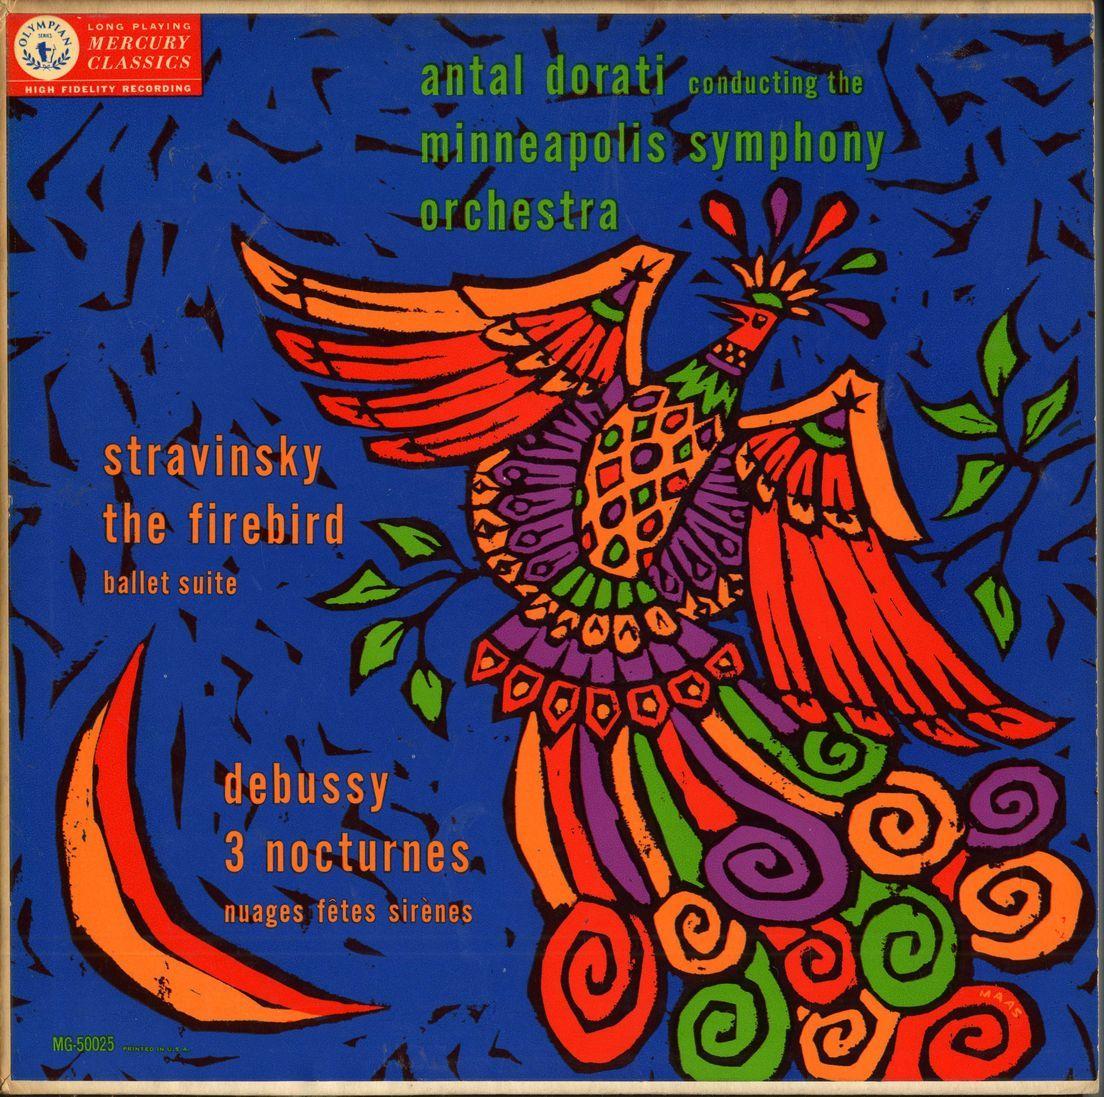 Dorati Minneapolis Symphony Orchestra Stravinsky The Firebird Debussy 3 Nocturnes Label Mercury Mg 50025 1954 Design Album Cover Art Nocturne Fire Bird